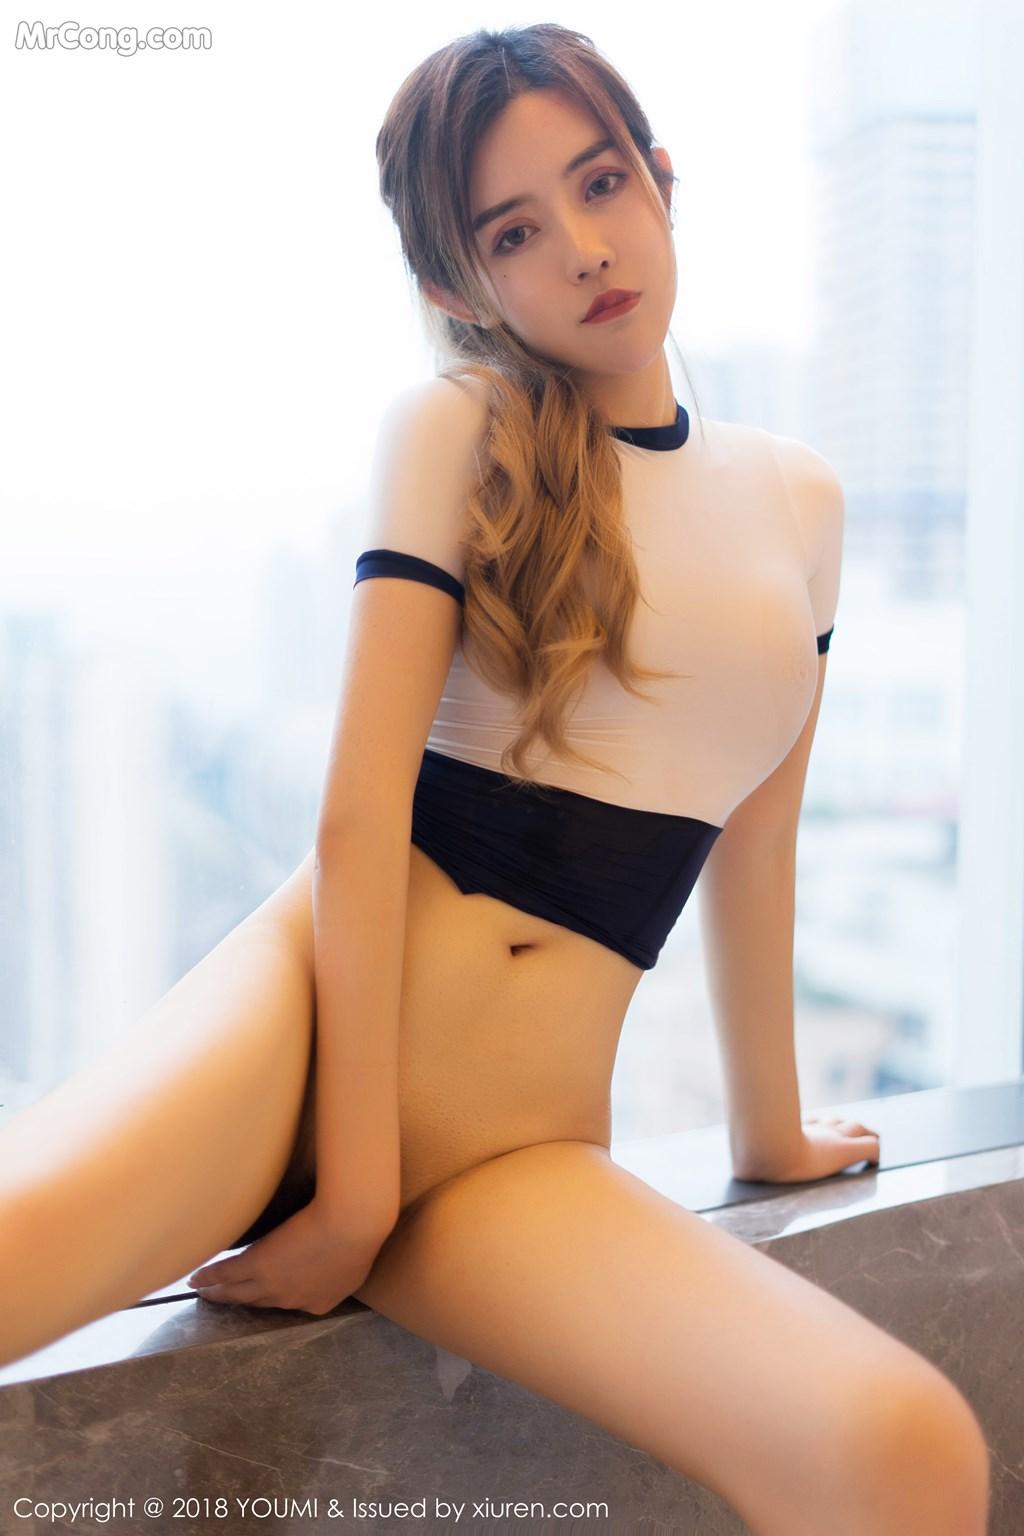 Image YouMi-Vol.235-Cris-MrCong.com-034 in post YouMi Vol.235: Người mẫu Cris_卓娅祺 (46 ảnh)